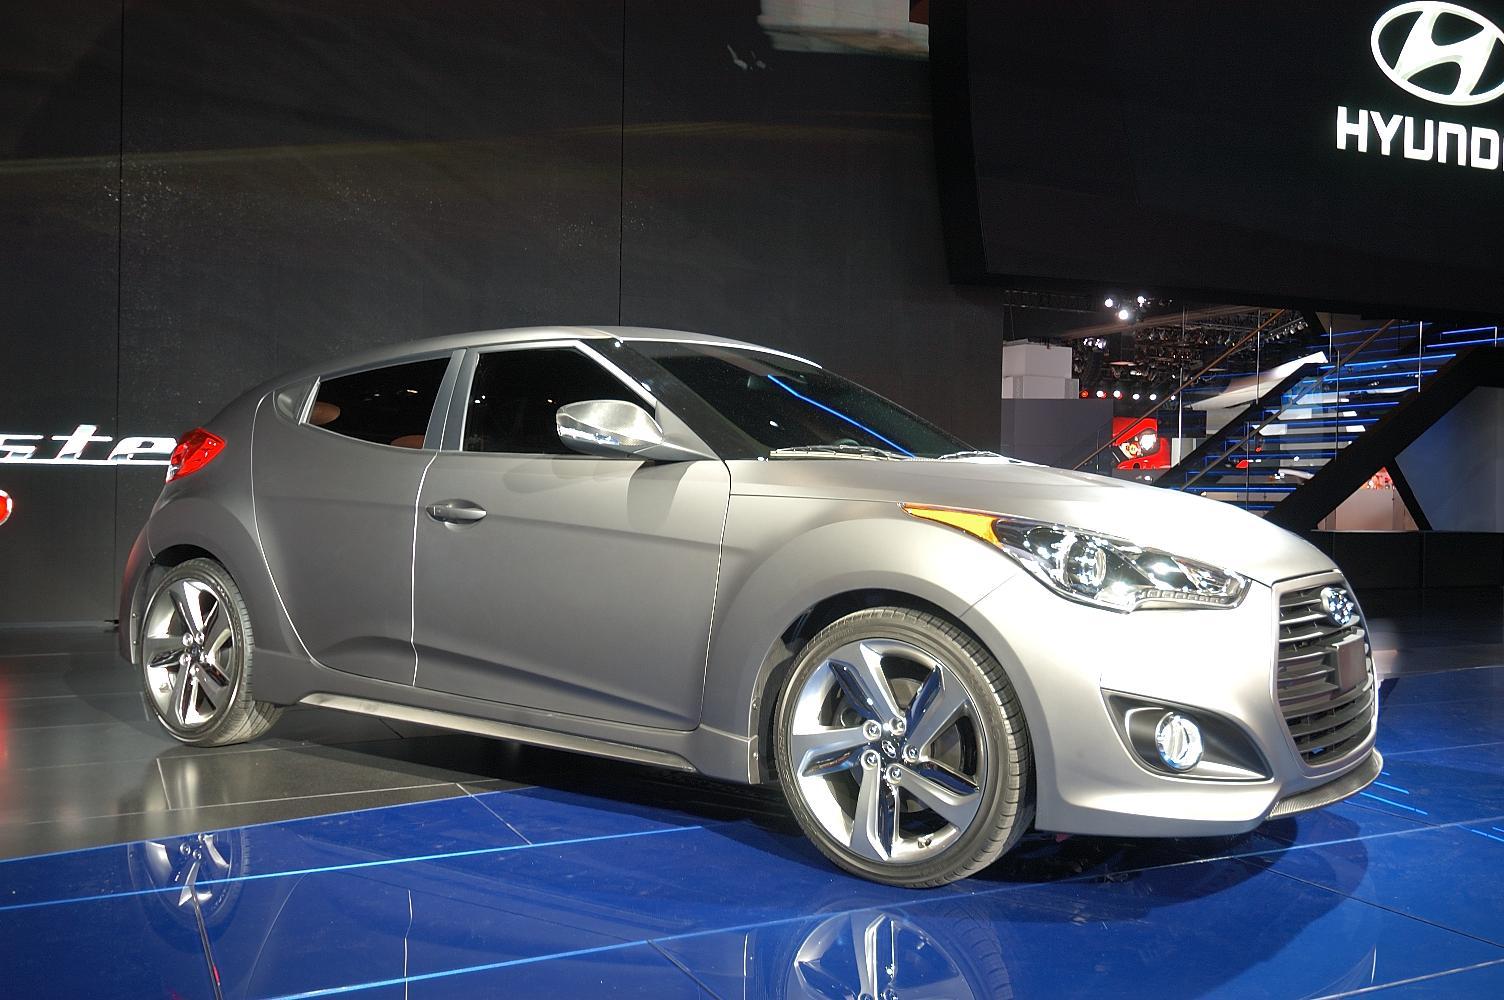 Hyundai Veloster NAIAS 2012 2